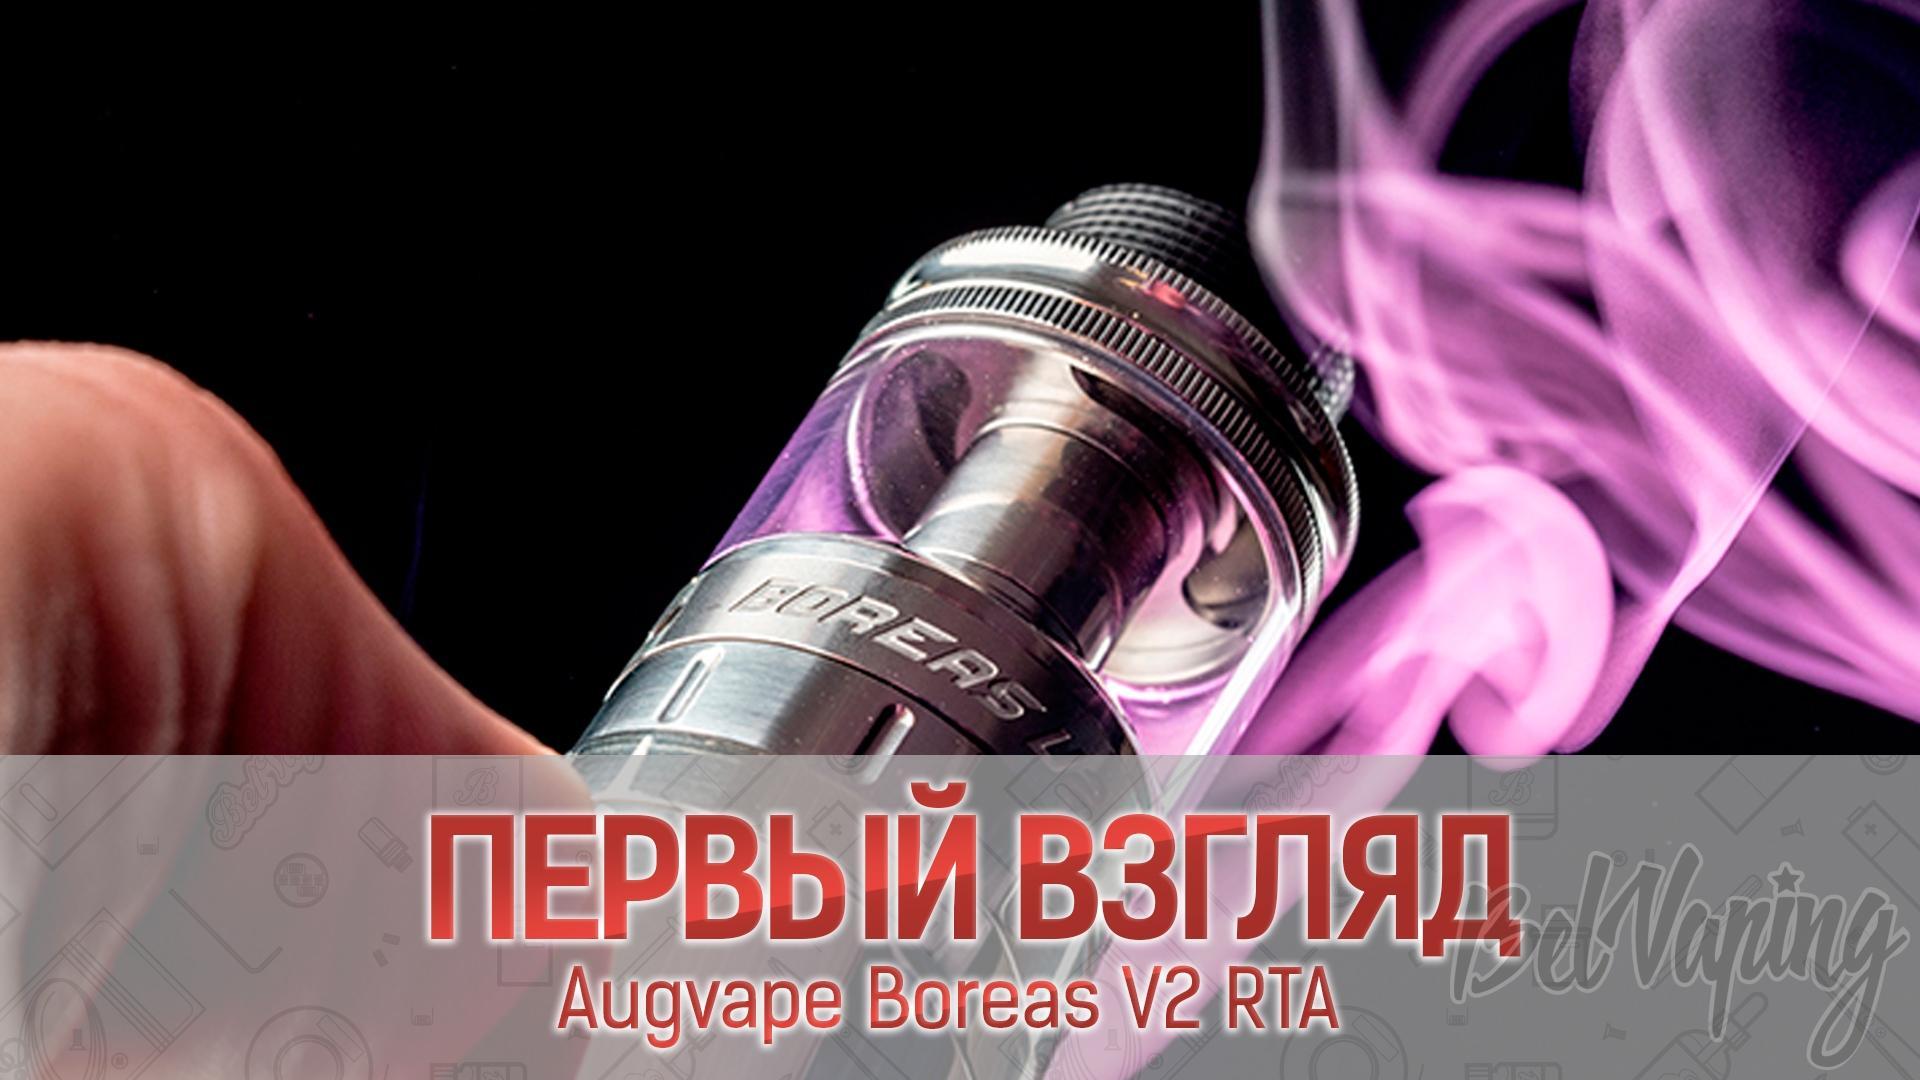 Augvape Boreas V2. Первый взгляд